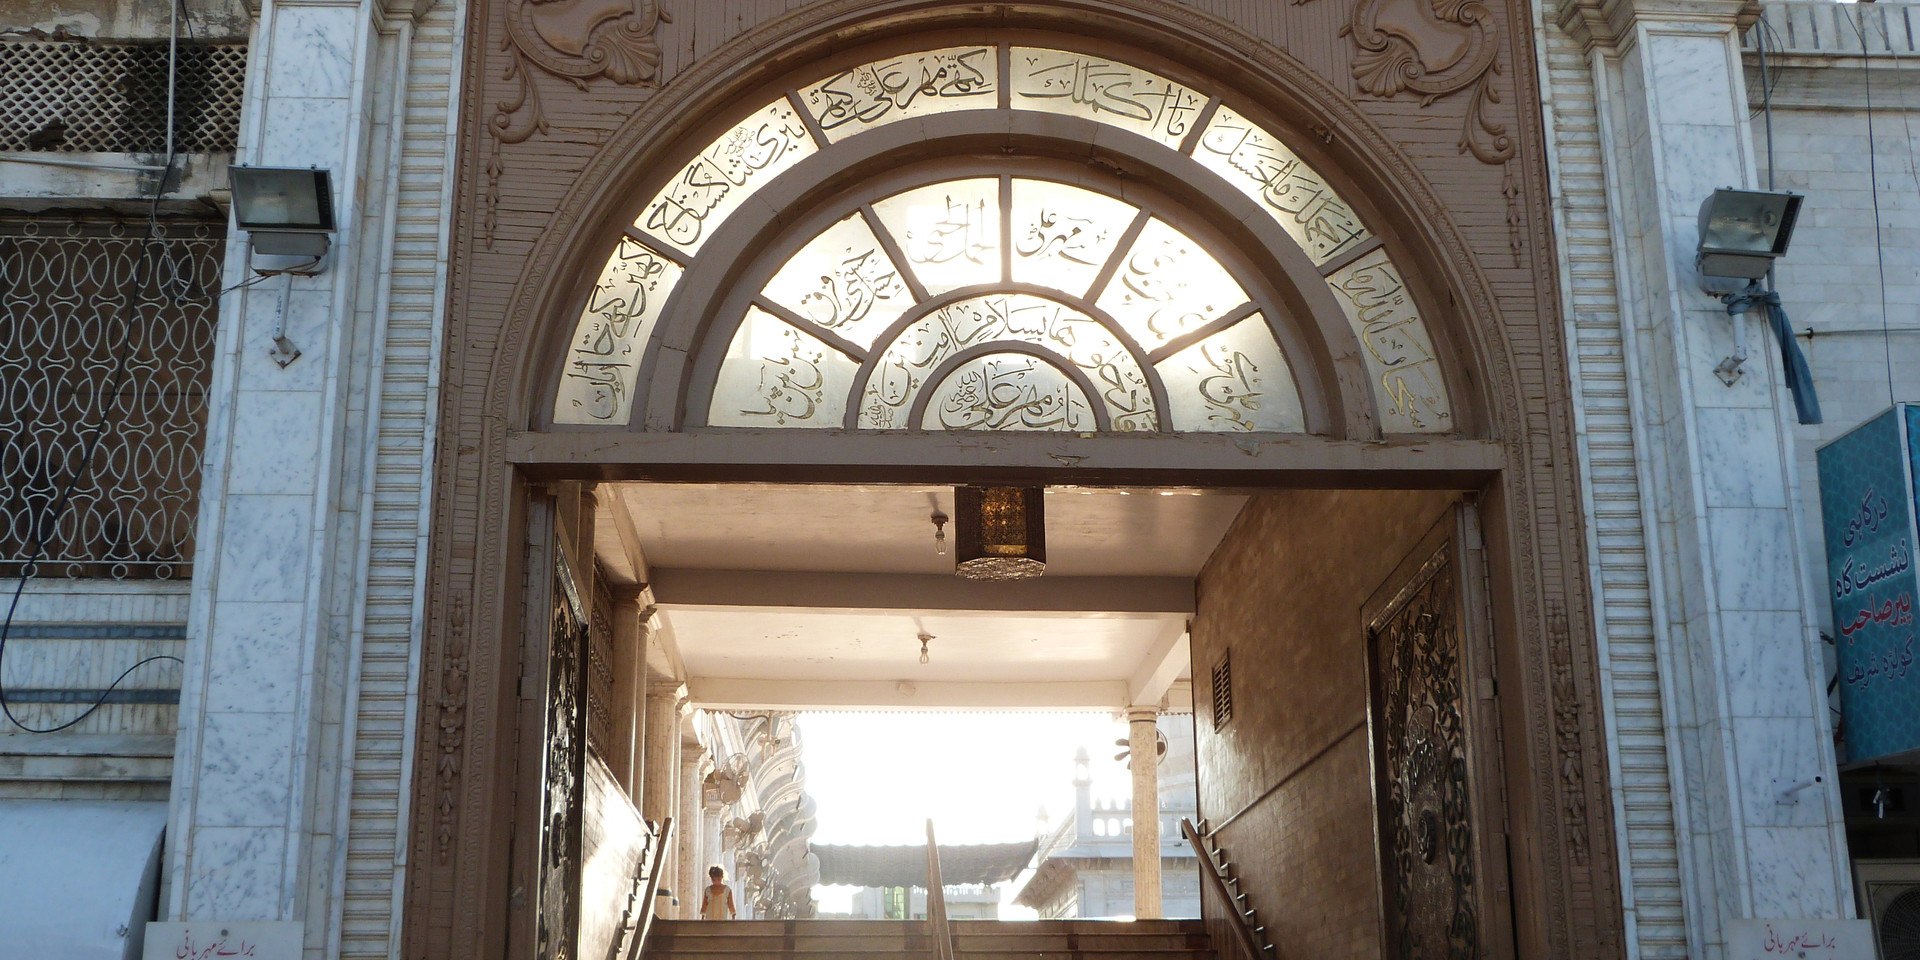 Entrance of Gorla Sharif